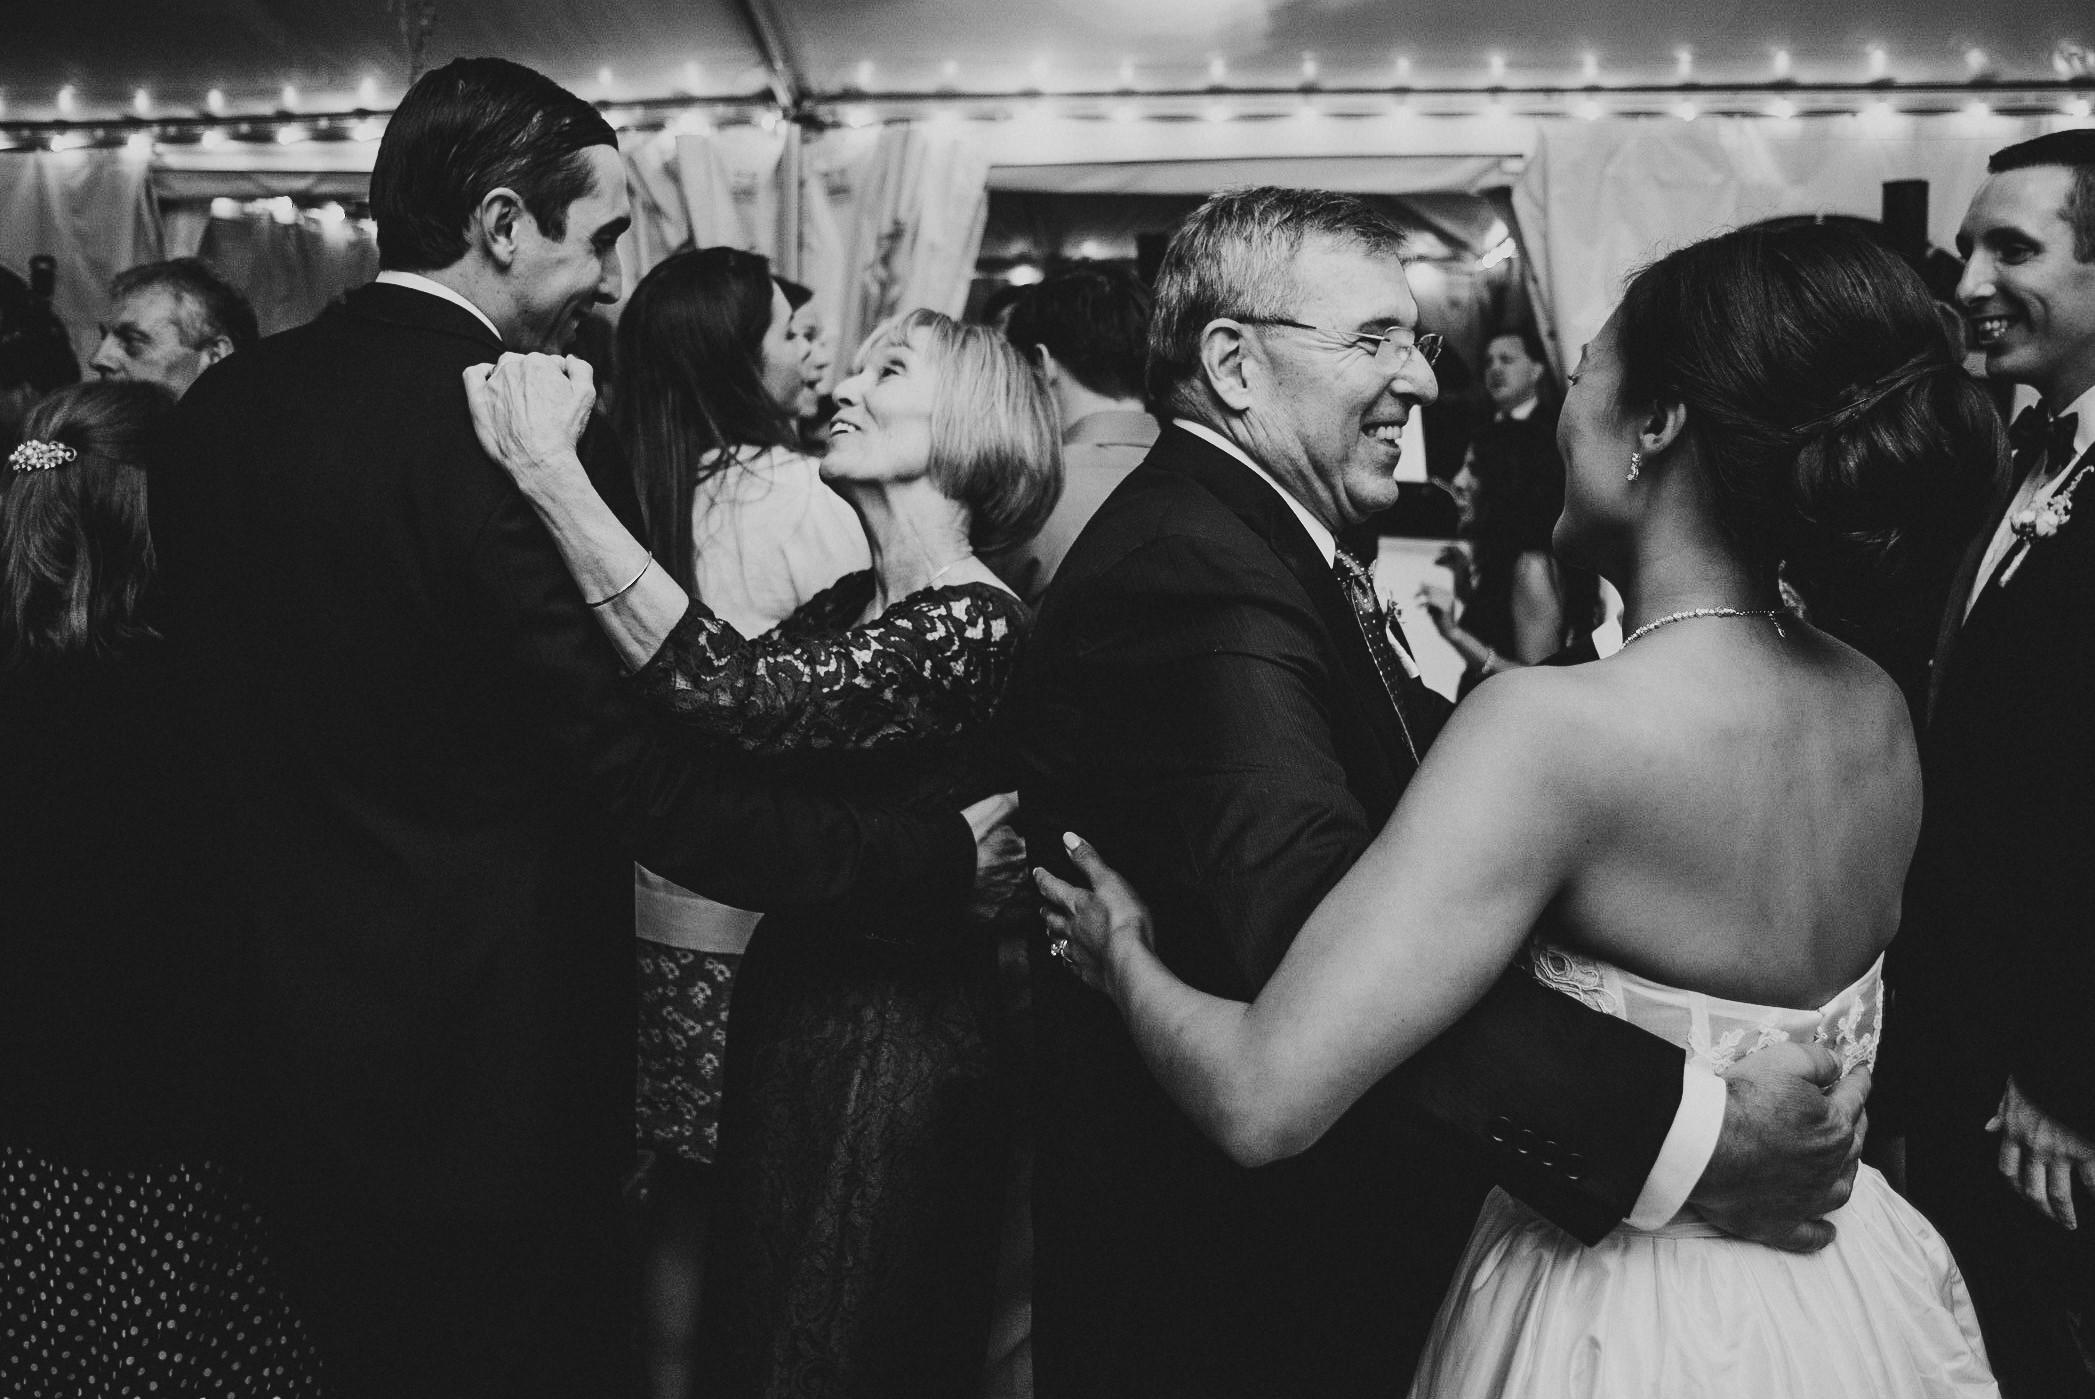 Wedding at Woodlawn Manor Sandy Spring Maryland by Mantas Kubilinskas-30.jpg